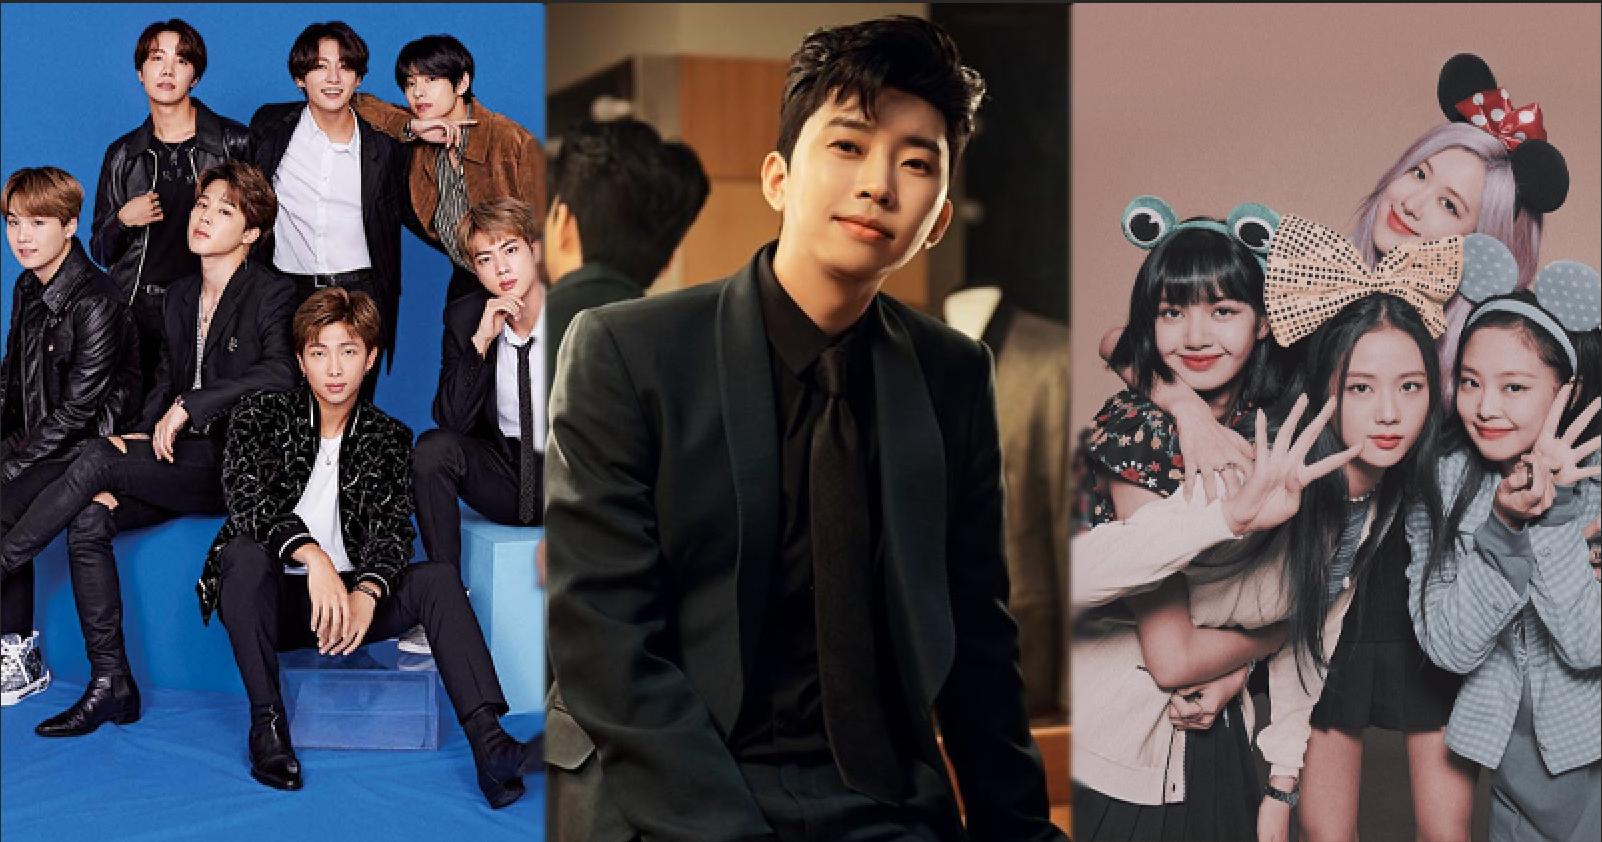 Check Out The September Brand Reputation Rankings for Korean Singers